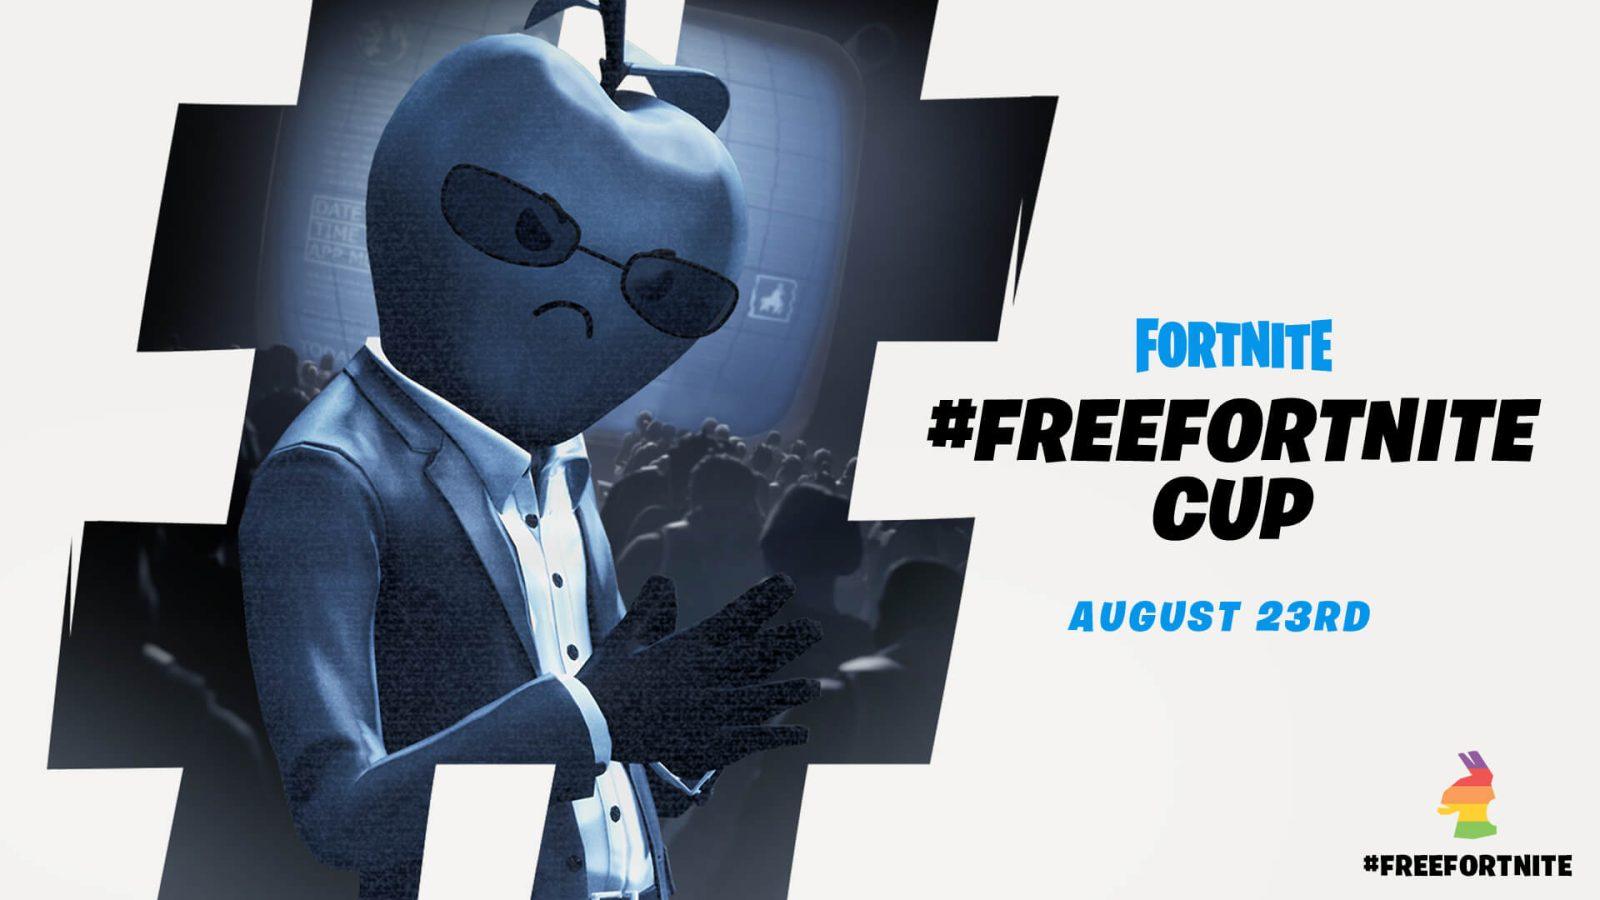 #FreeFortnite Cup poster